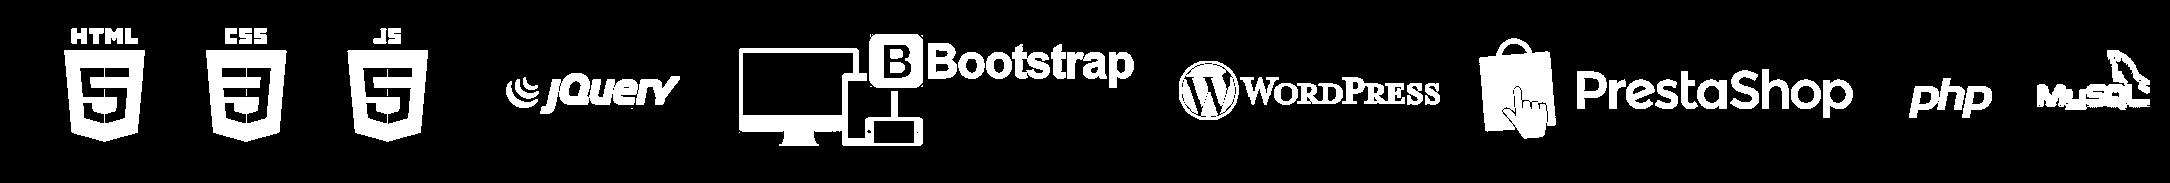 web design logos